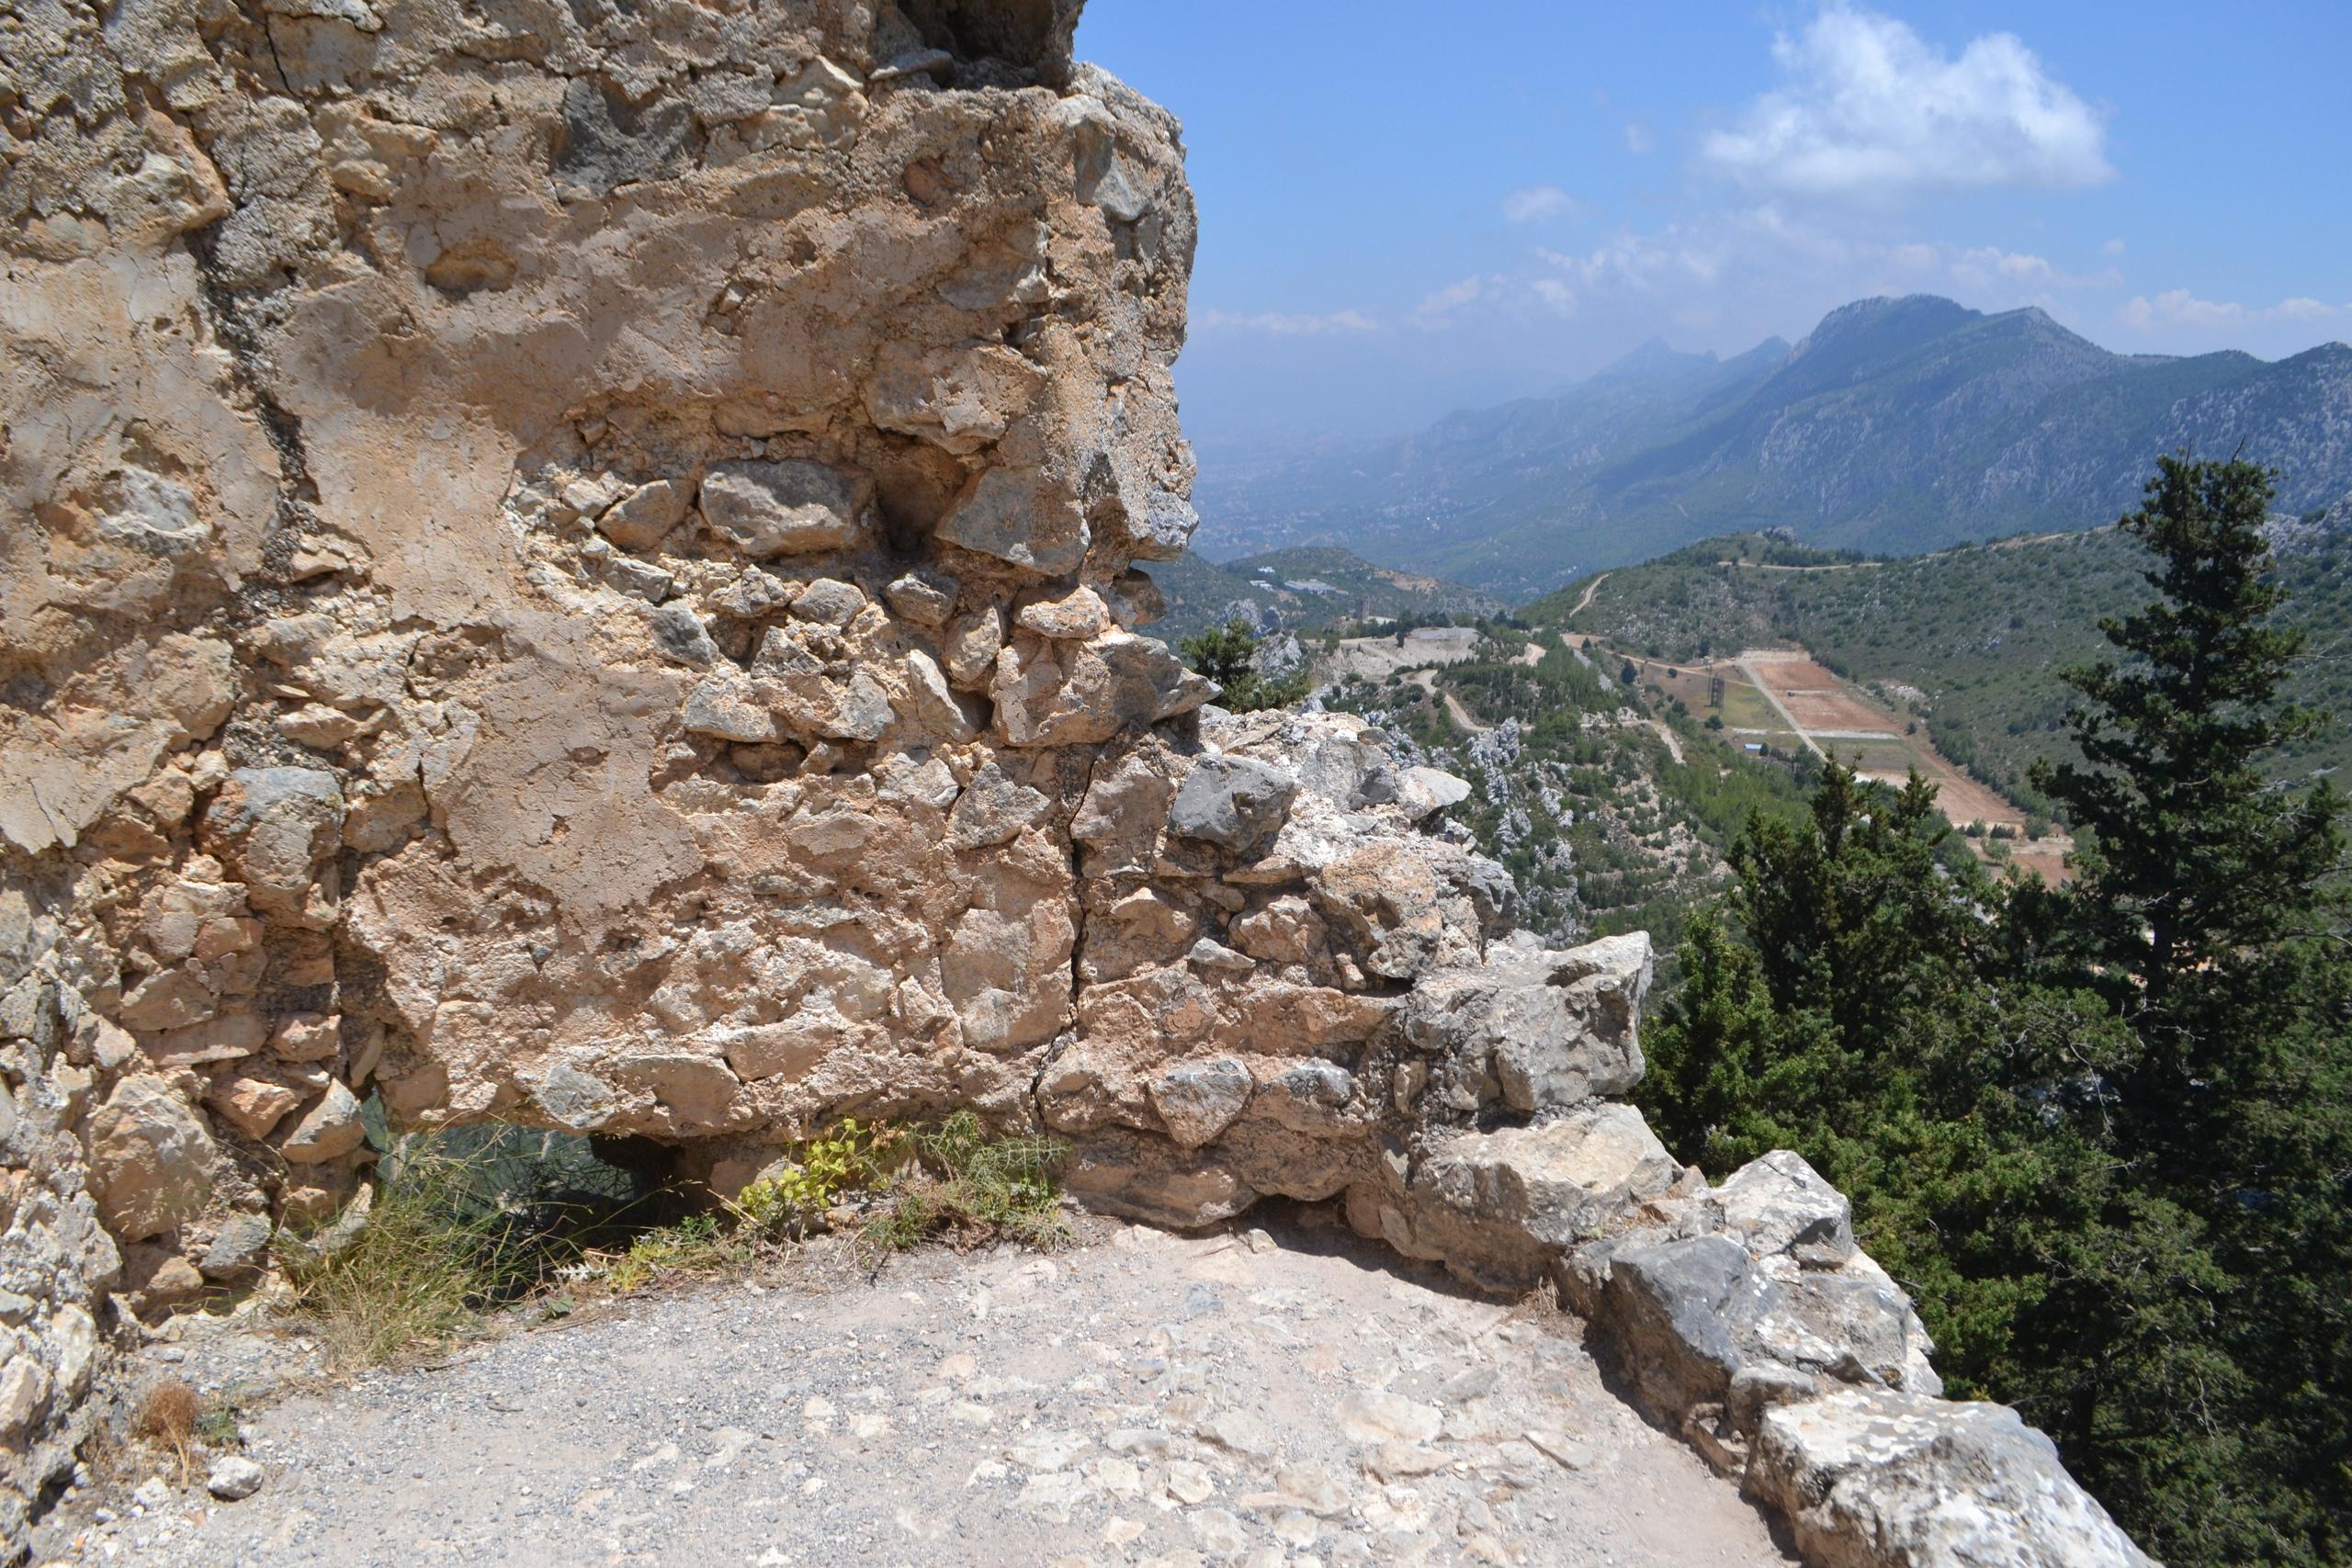 Северный Кипр. Замок Святого Иллариона. (фото). - Страница 3 NchaaTpa5f0